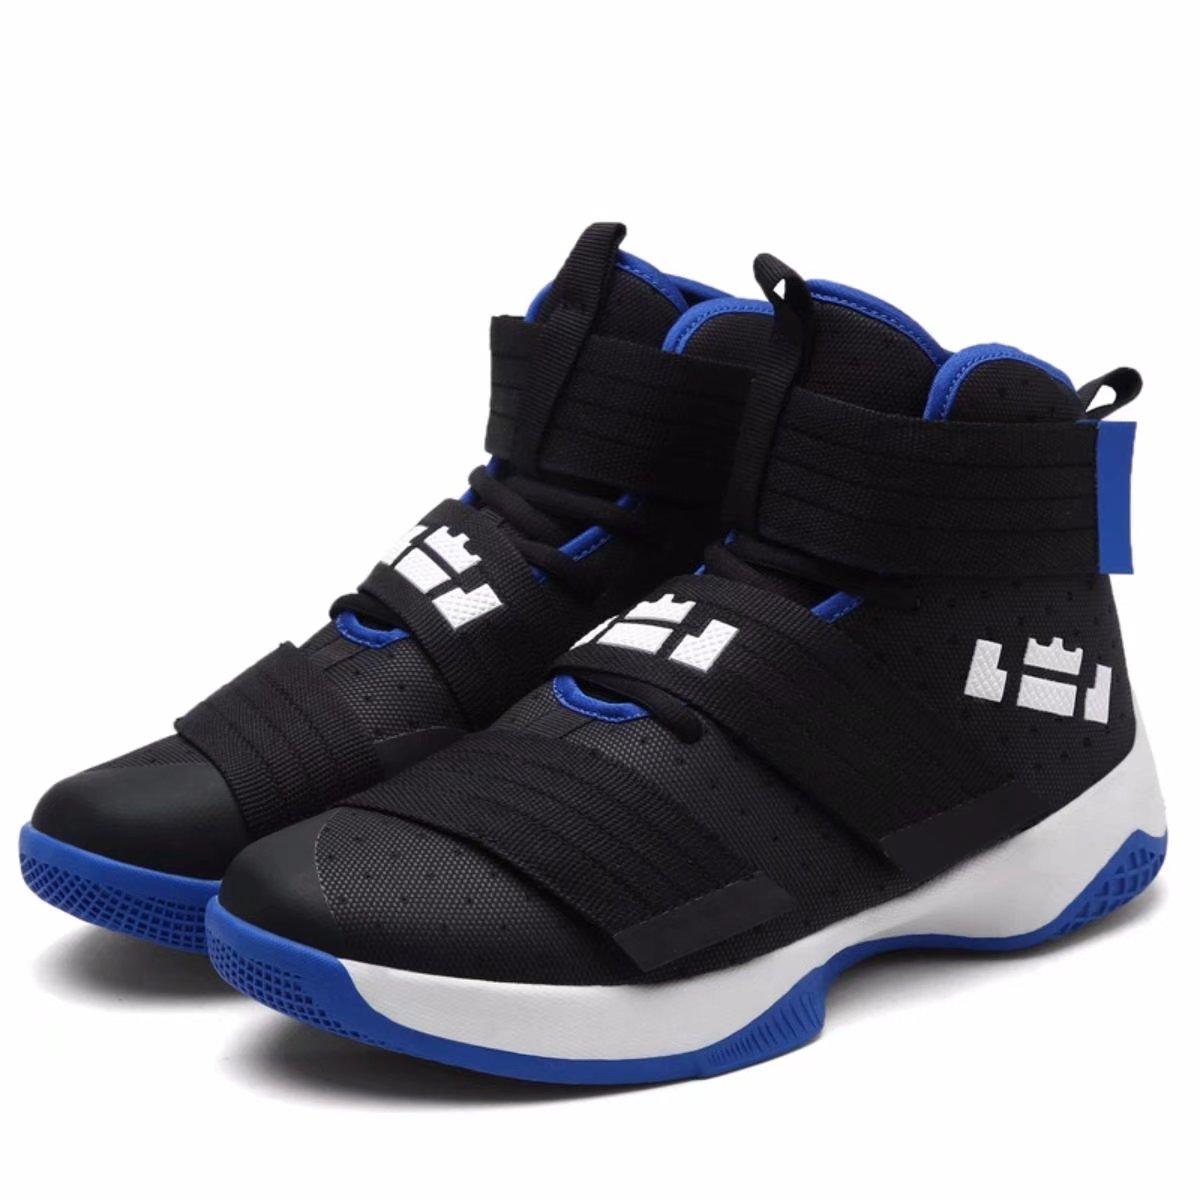 Men's Performance Velcro All-Star Sports Running Shoe Crazy Explosive Mid Basketball Shoes Sneakers for Women B07C79HSXT 11 US-Women|9.5 US-Men|Foot Length 10.43(in)|Black-blue